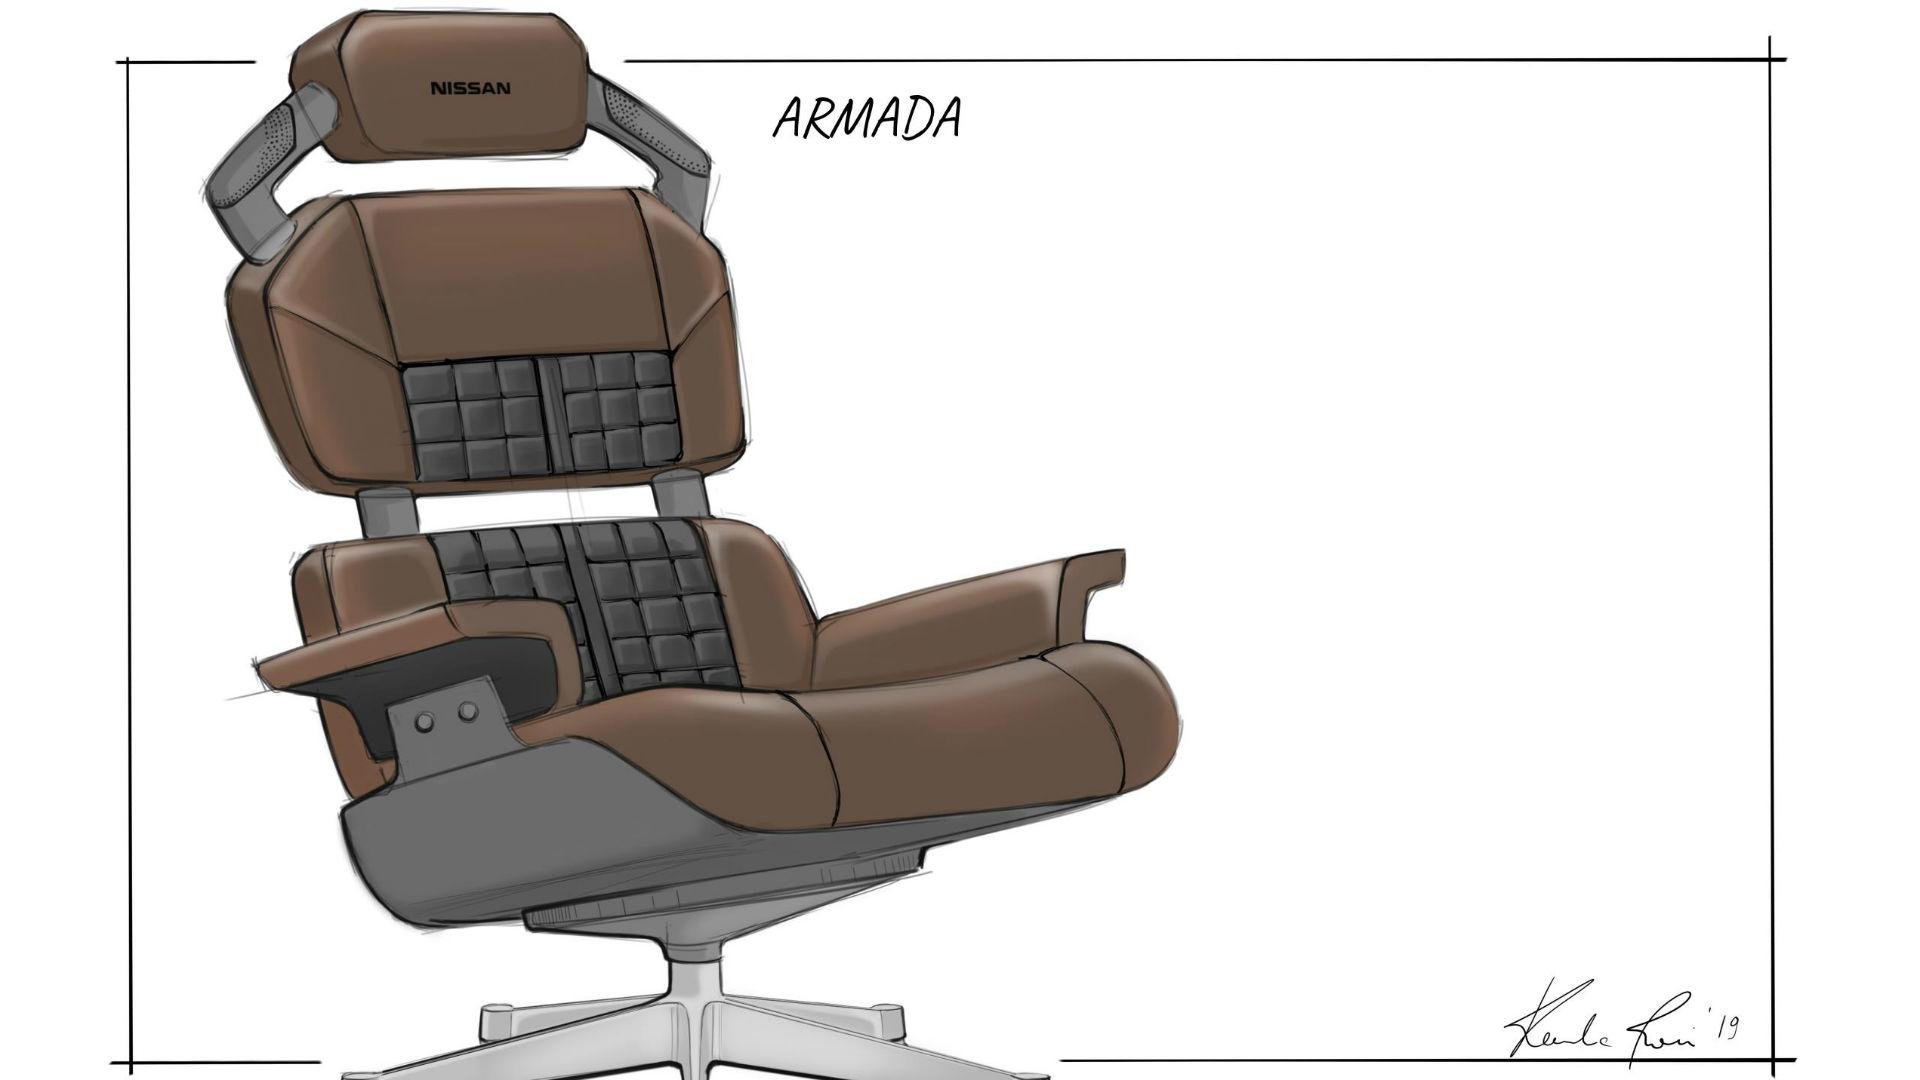 Nissan Armada gaming chair